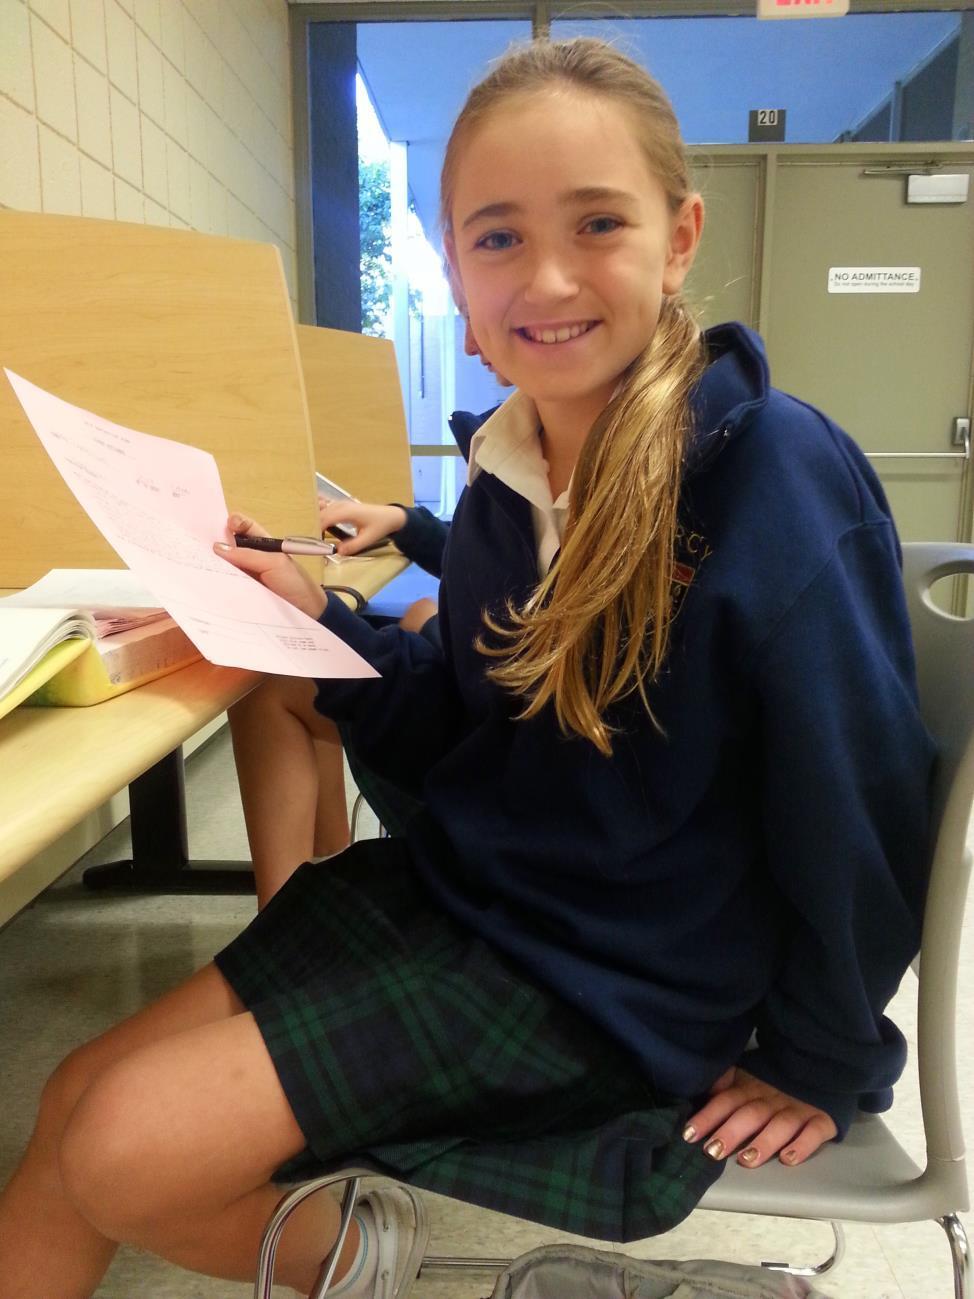 Freshman Ava Zaremski proudly holds her nomination form to be treasurer.